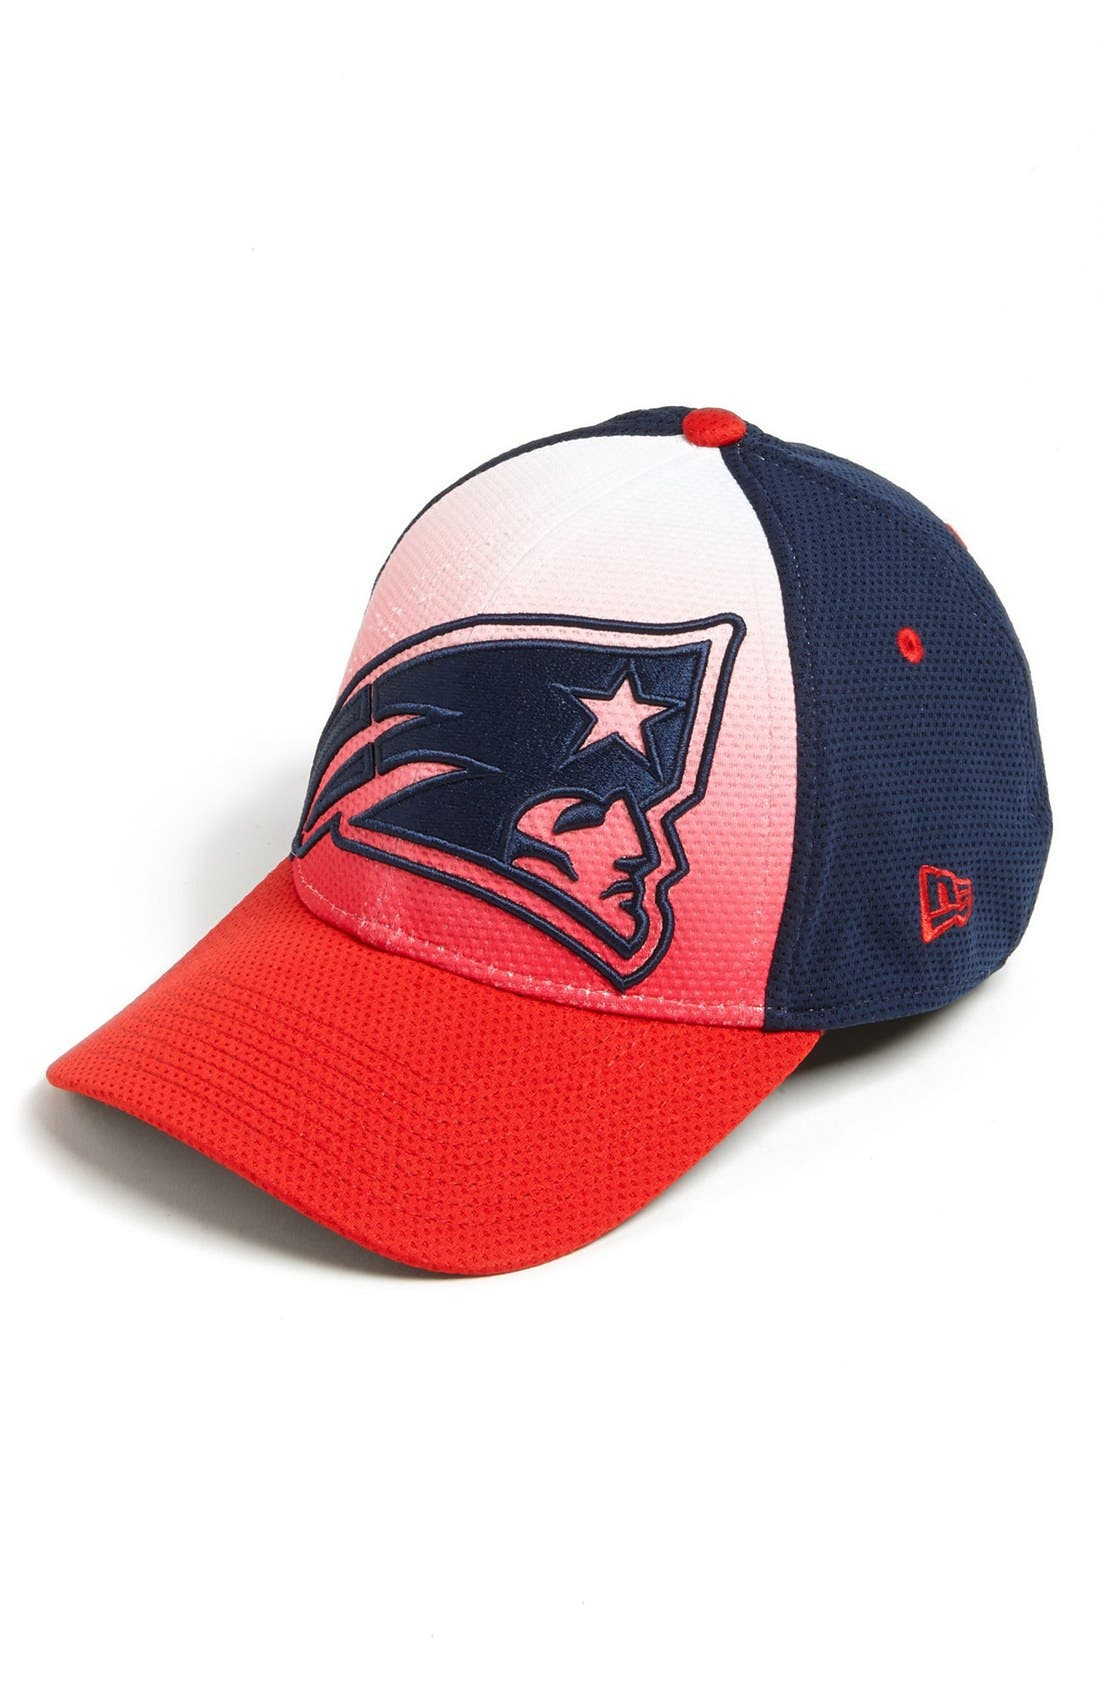 Main Image - New Era Cap 'Gradation - New England Patriots' Baseball Cap